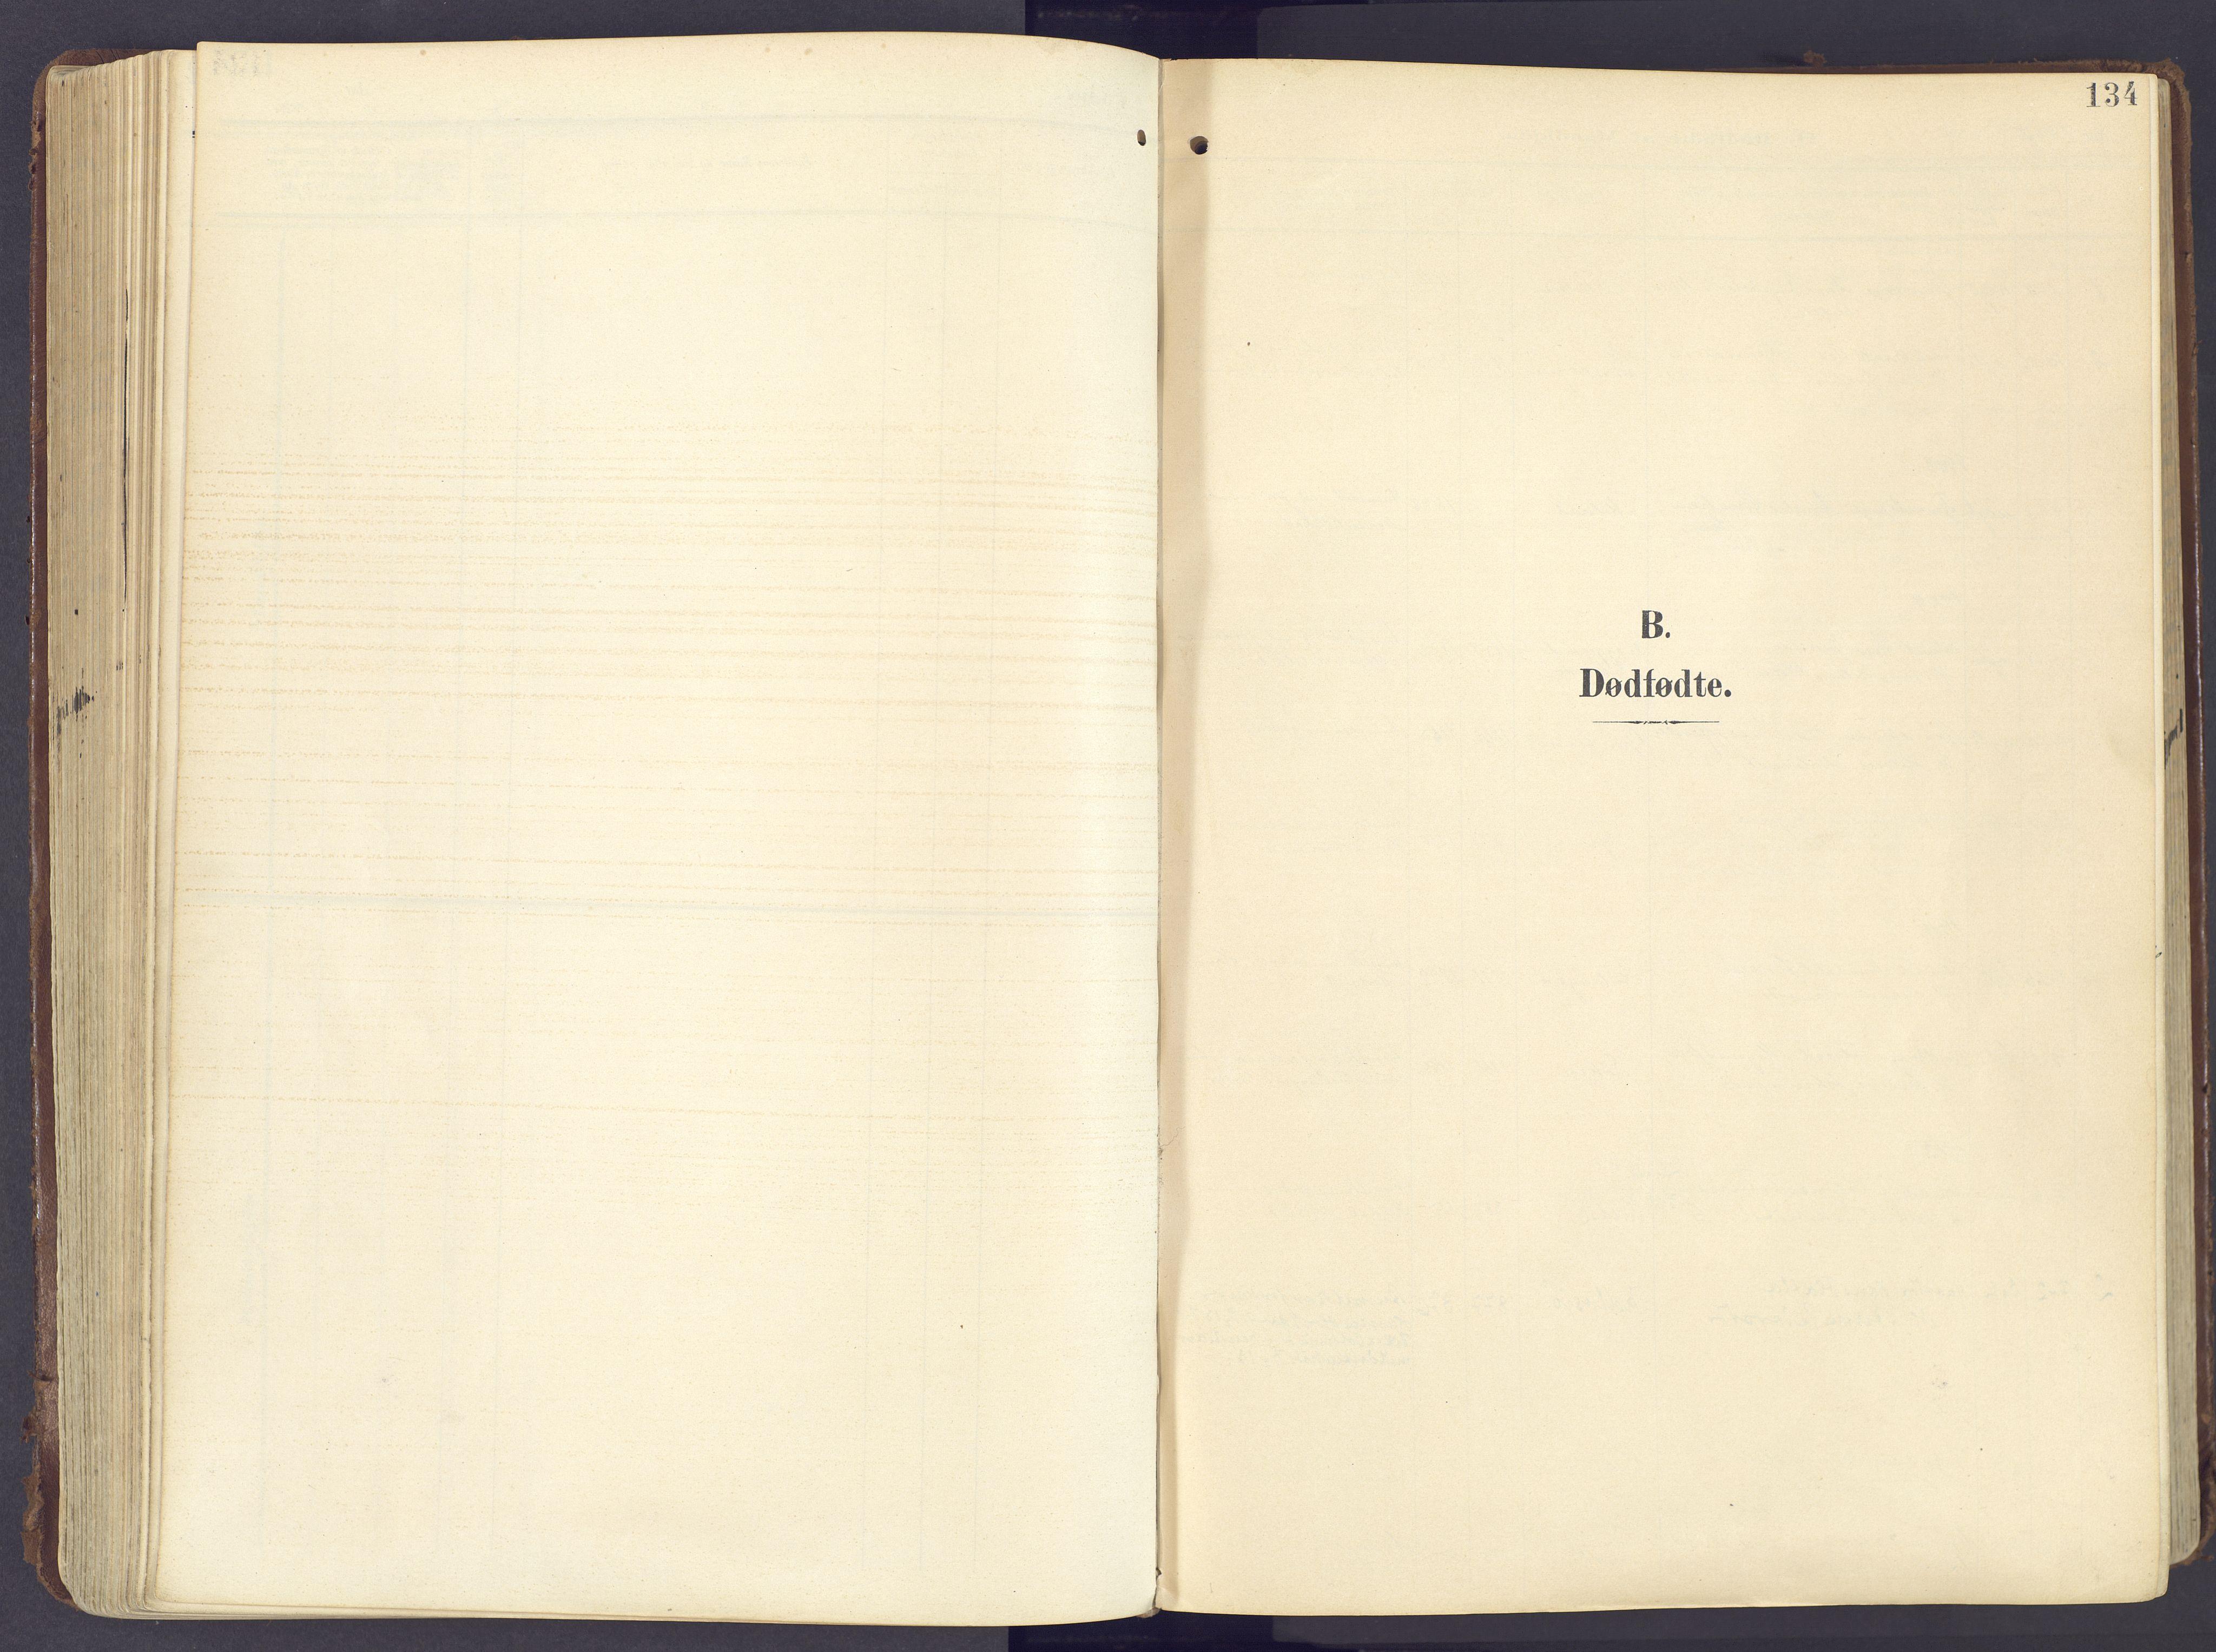 SAH, Lunner prestekontor, H/Ha/Haa/L0001: Ministerialbok nr. 1, 1907-1922, s. 134